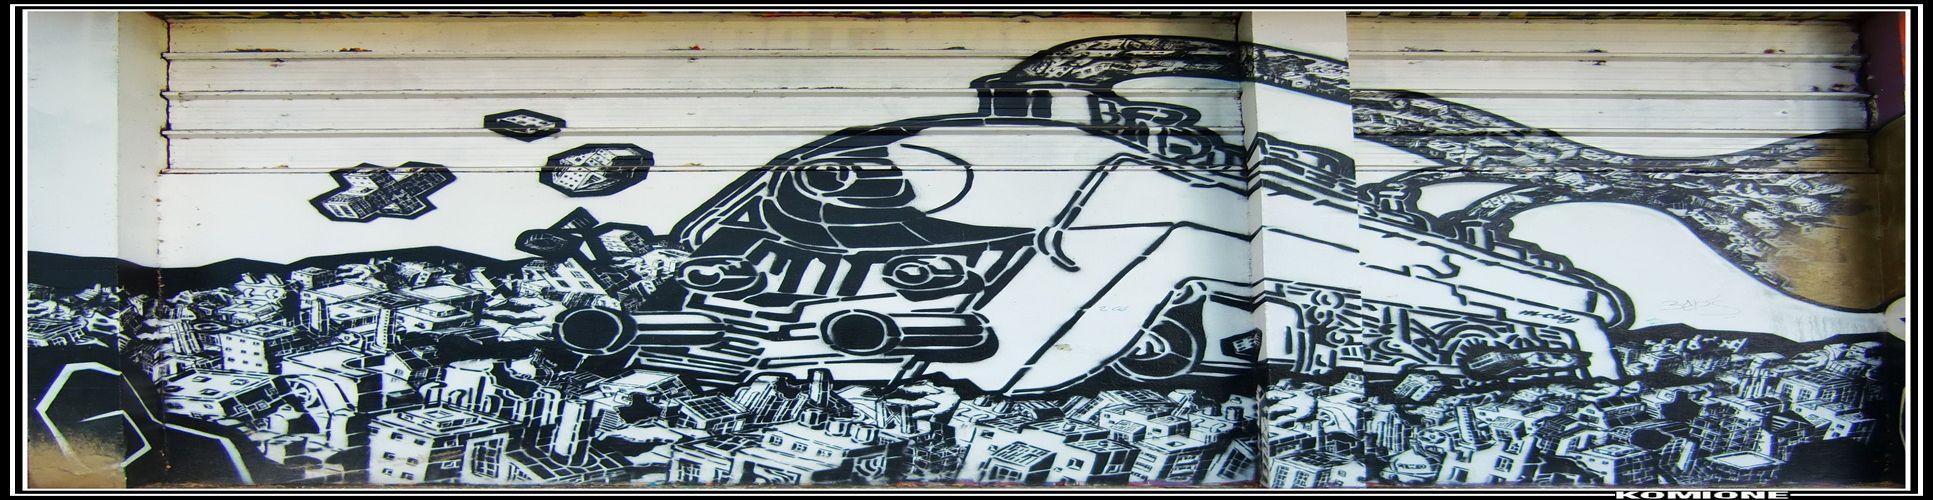 Artwork By M-City in Bondy